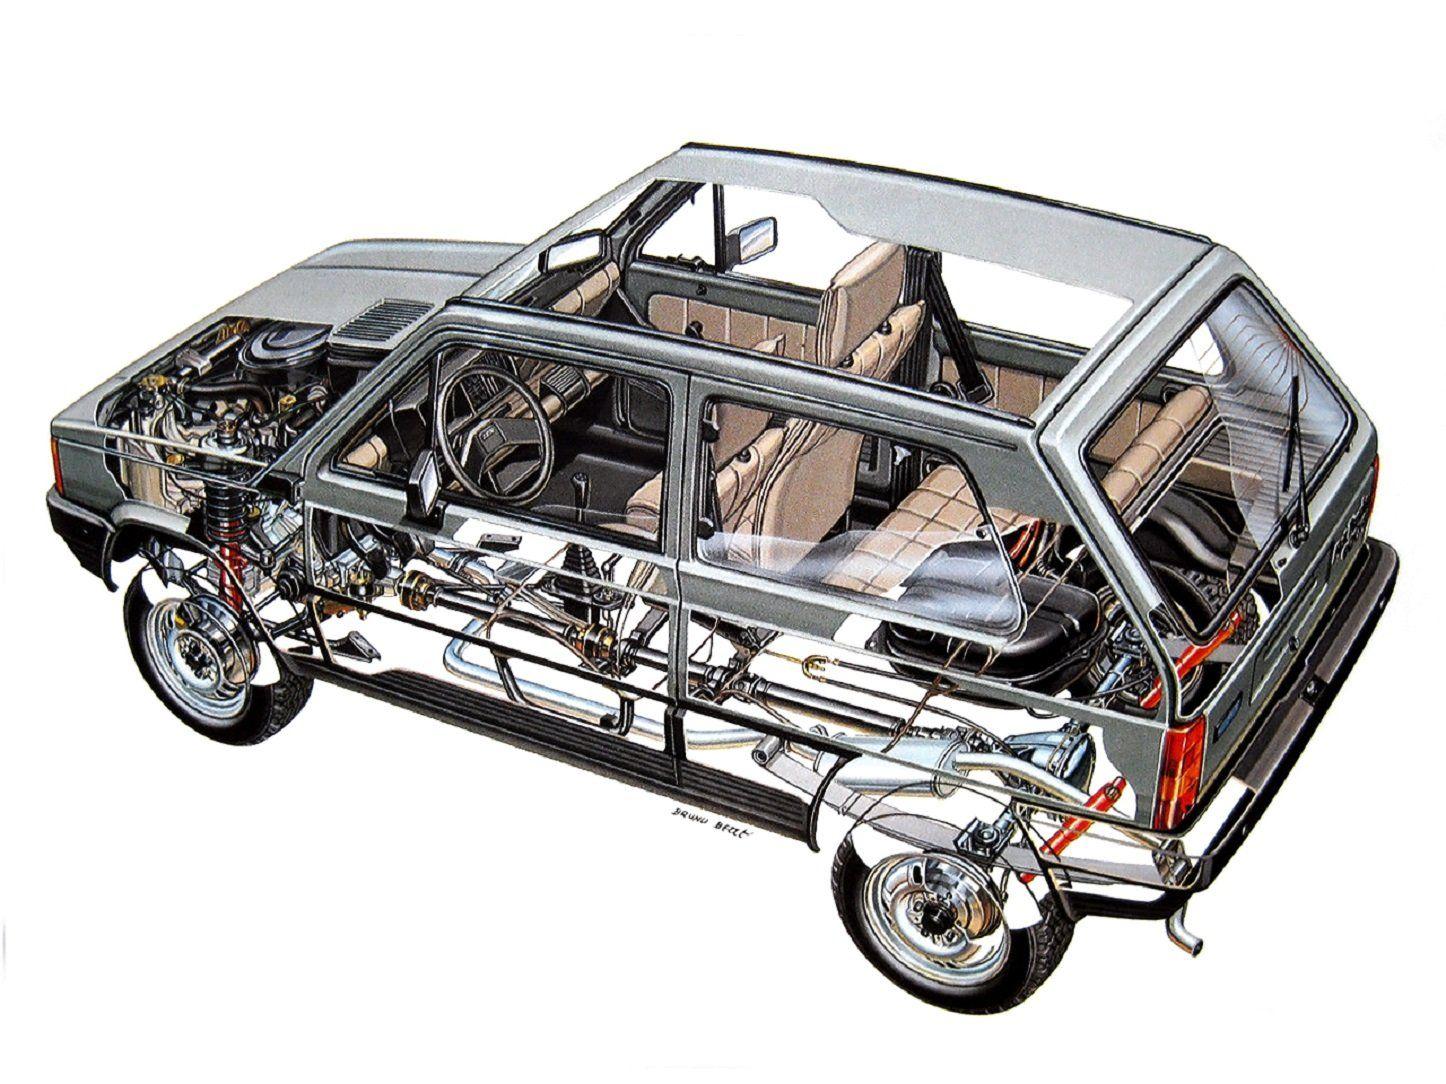 Fiat panda technical cars wallpaper 1446x1084 659089 1446x1084